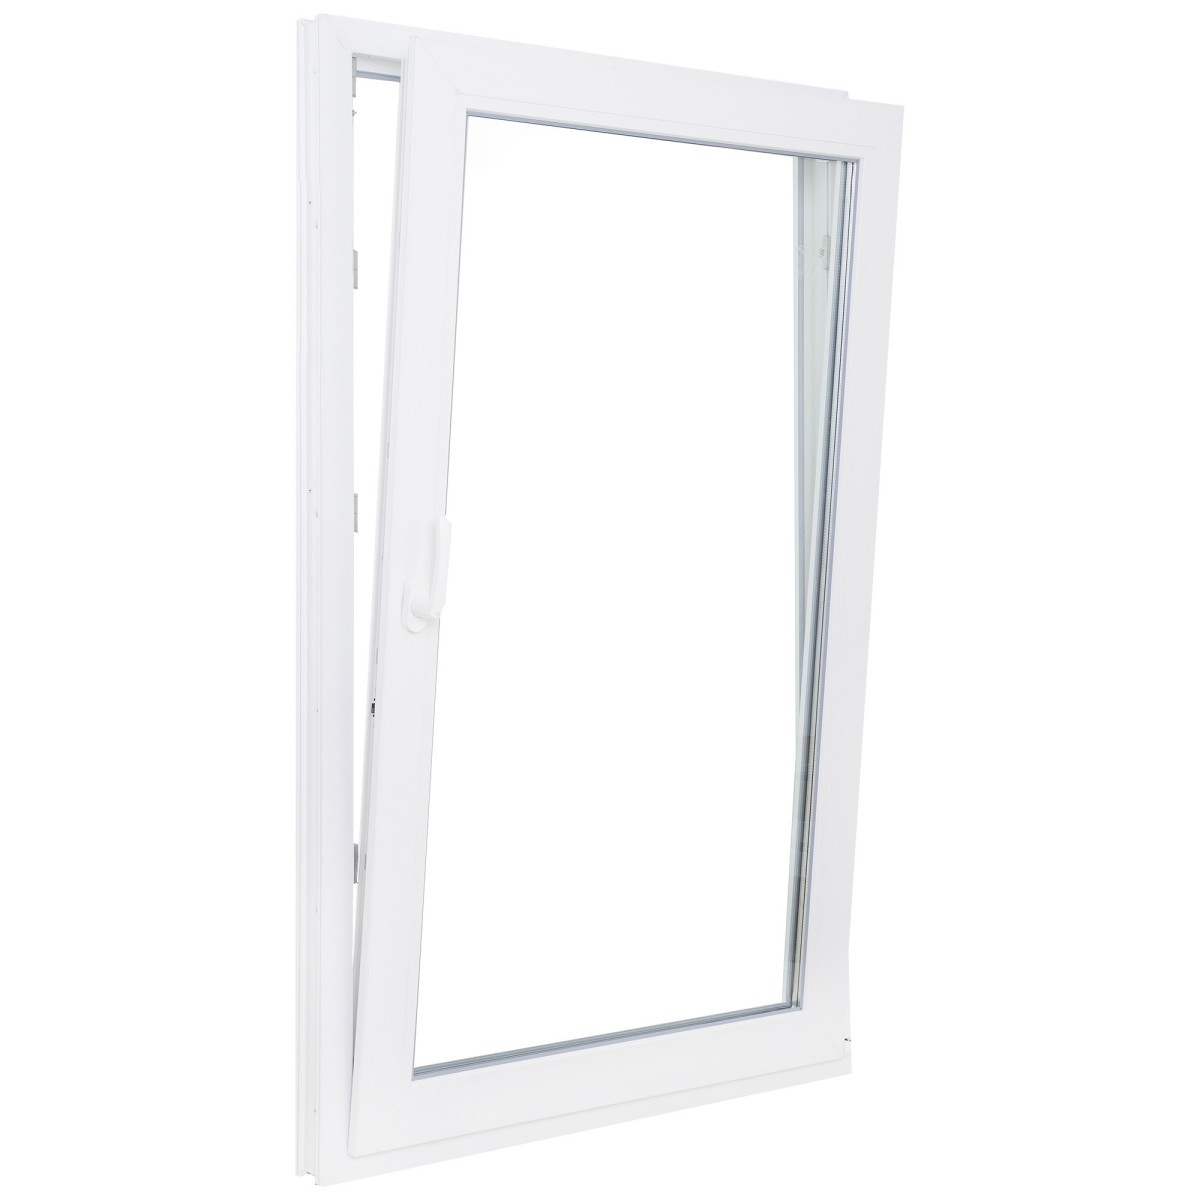 Окно ПВХ одностворчатое 116х100 см поворотно-откидное правое